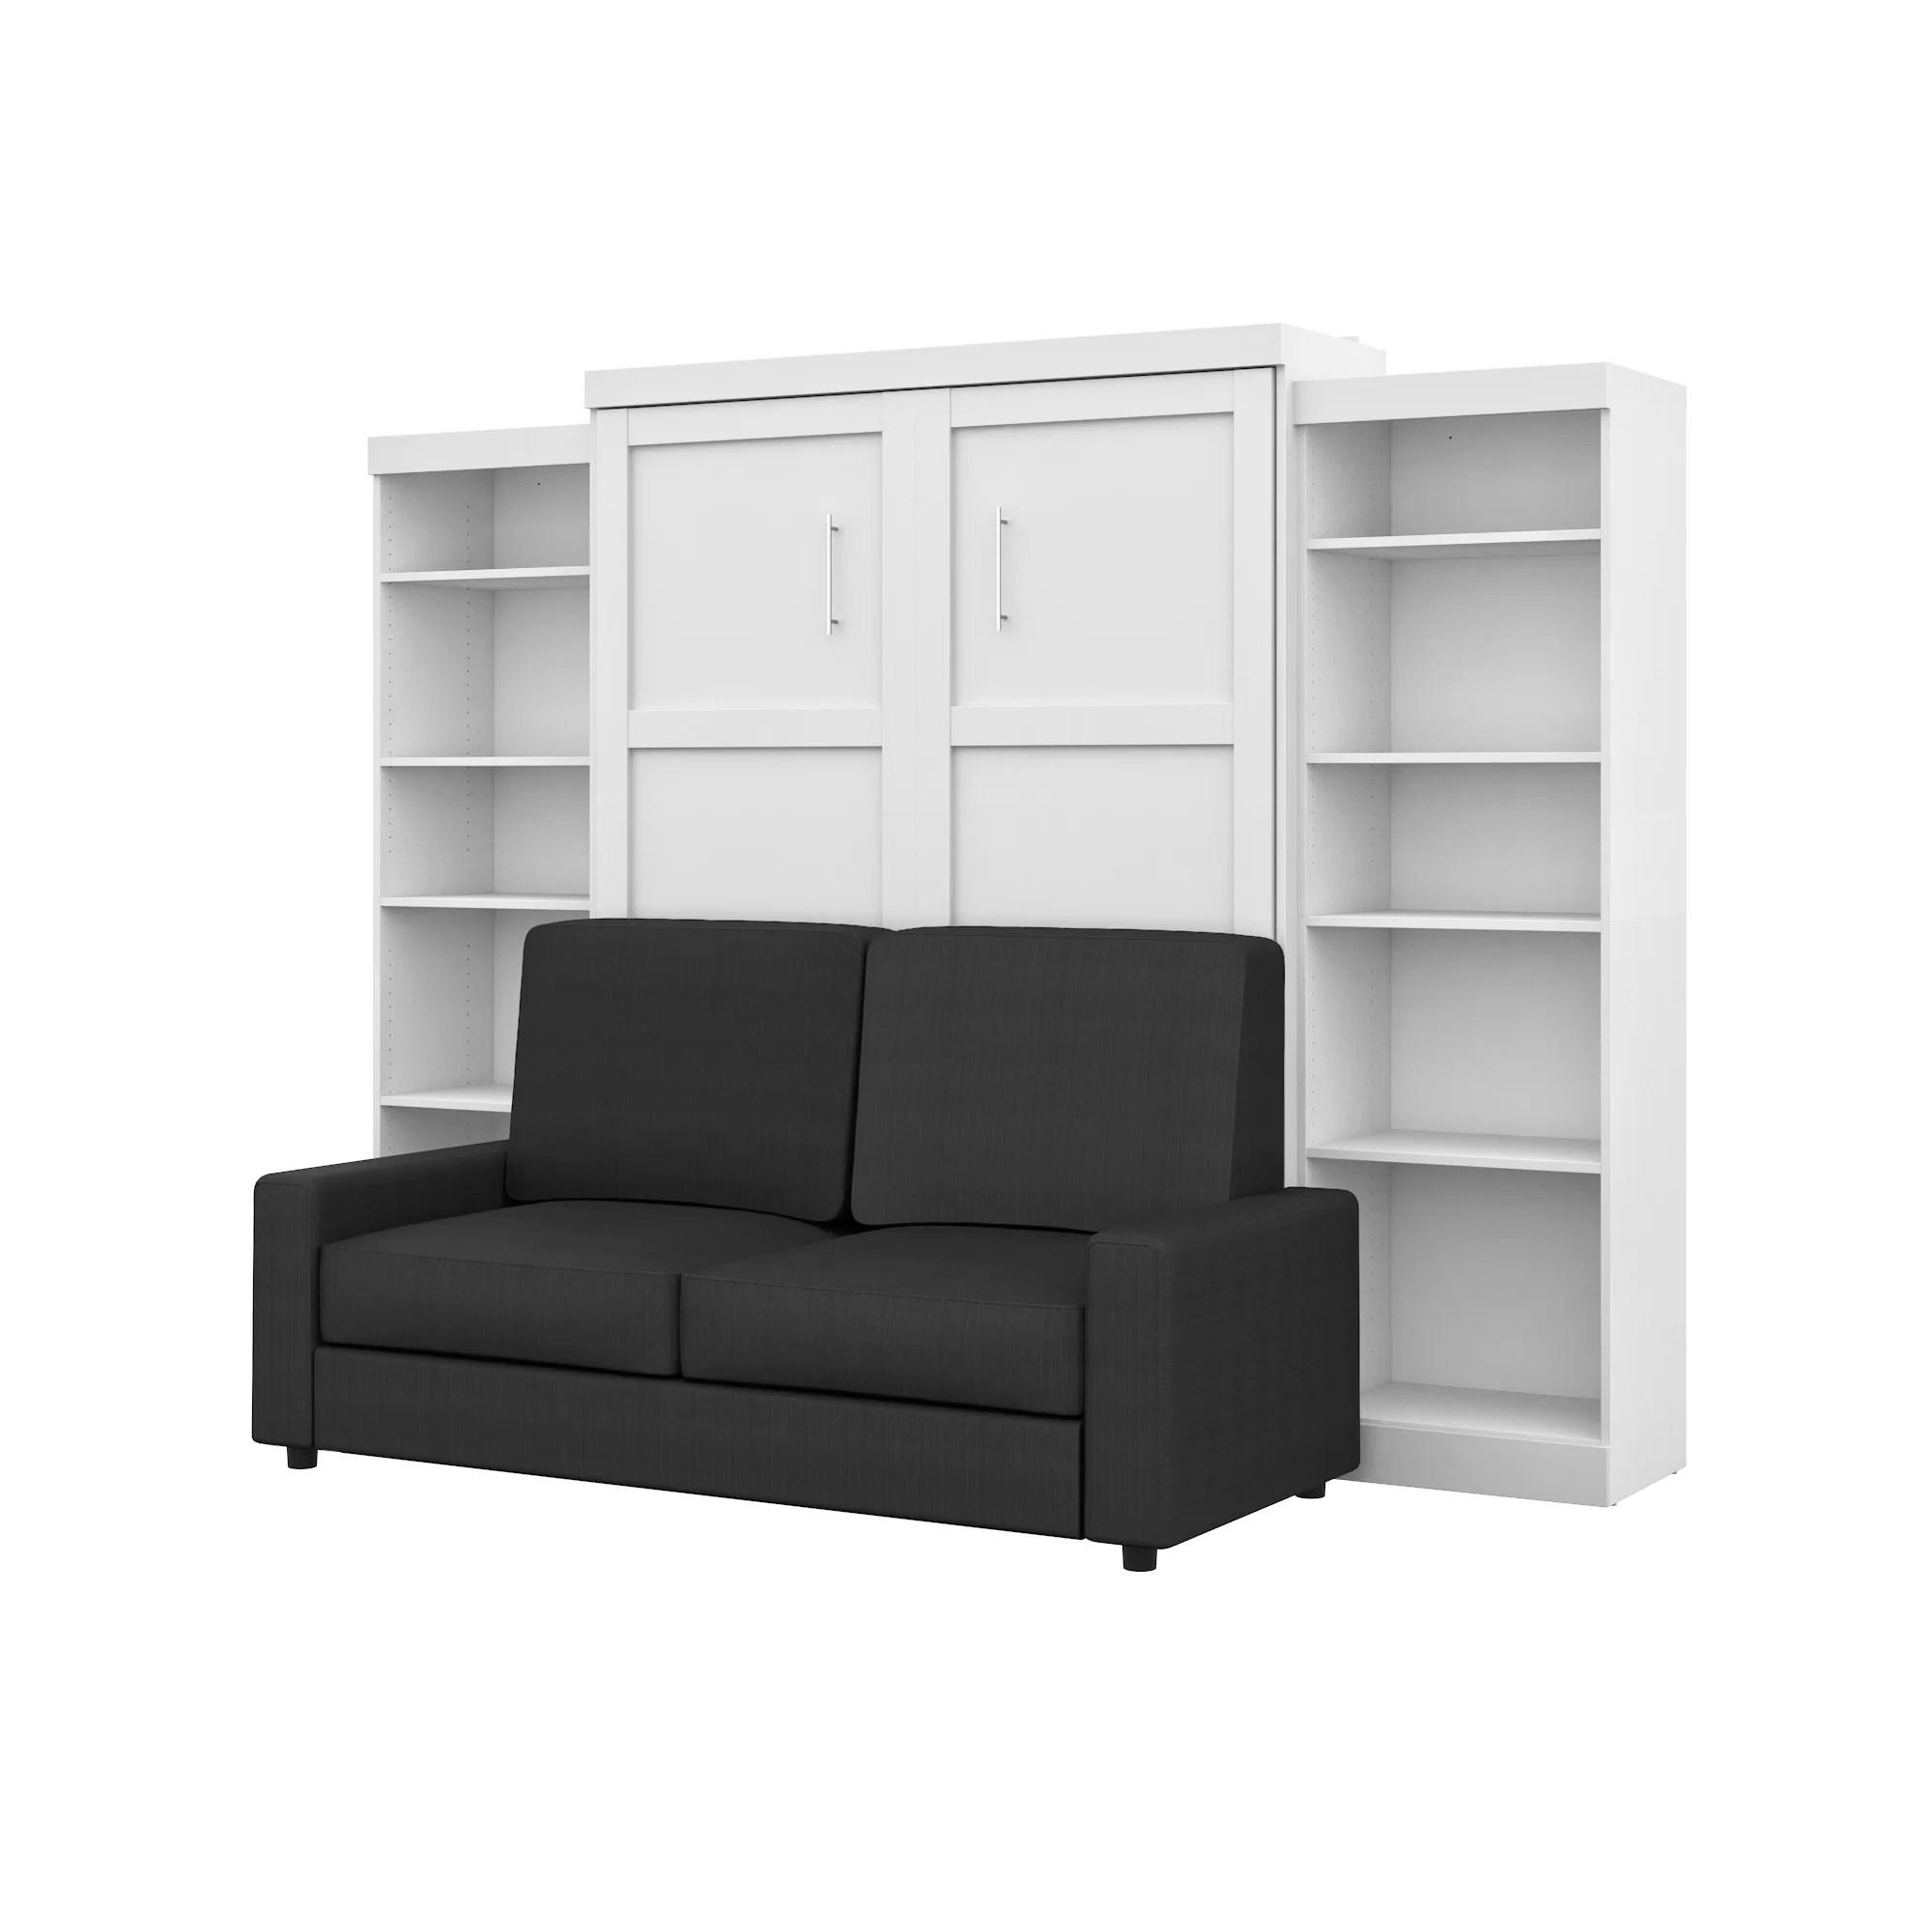 cyprian storage murphy bed